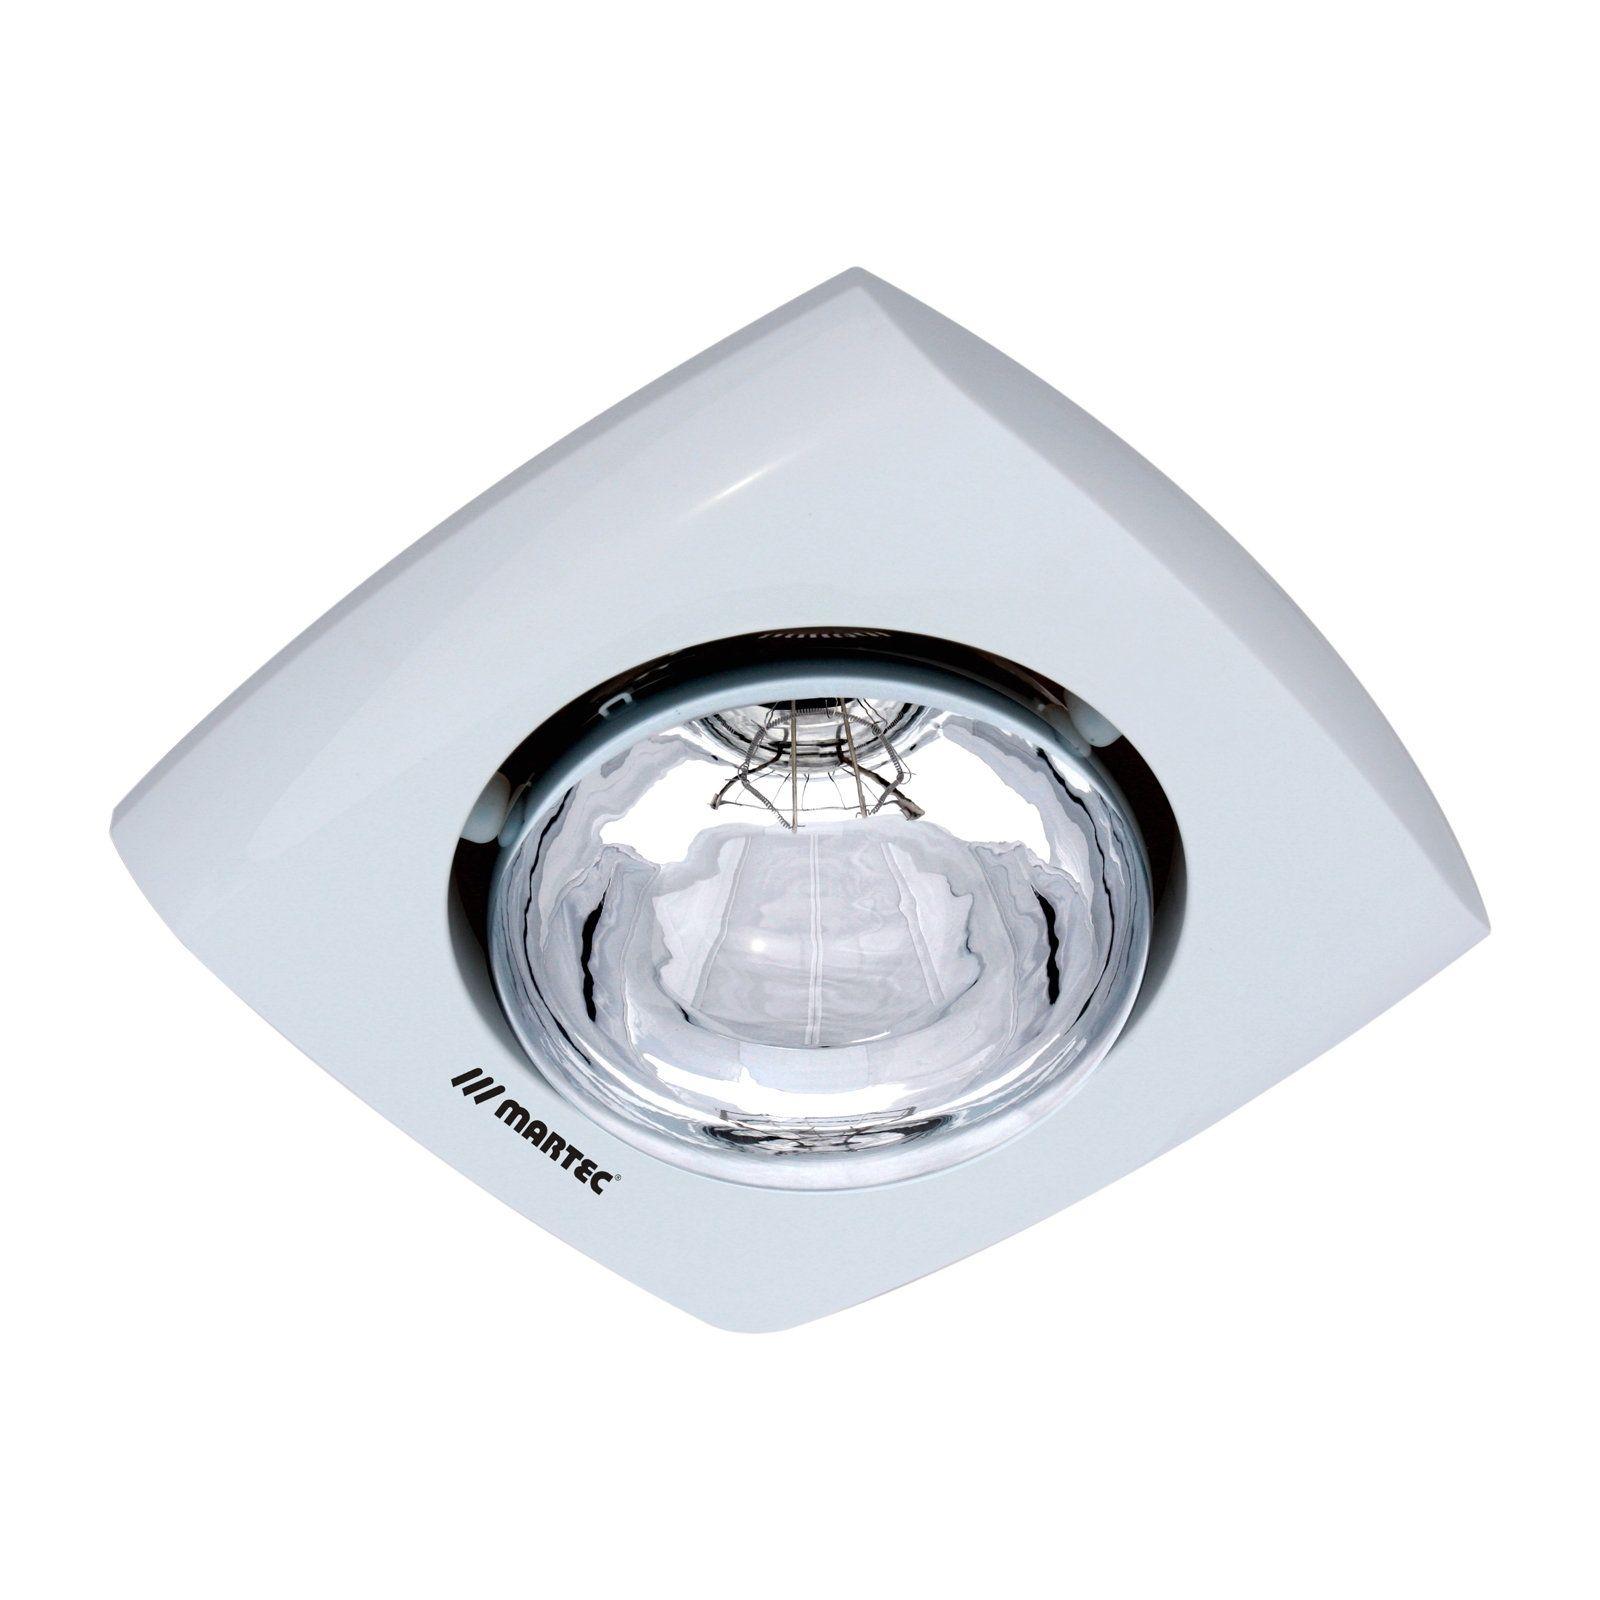 Ixl heat lamp exhaust fan httpurresults pinterest ixl heat lamp exhaust fan aloadofball Choice Image